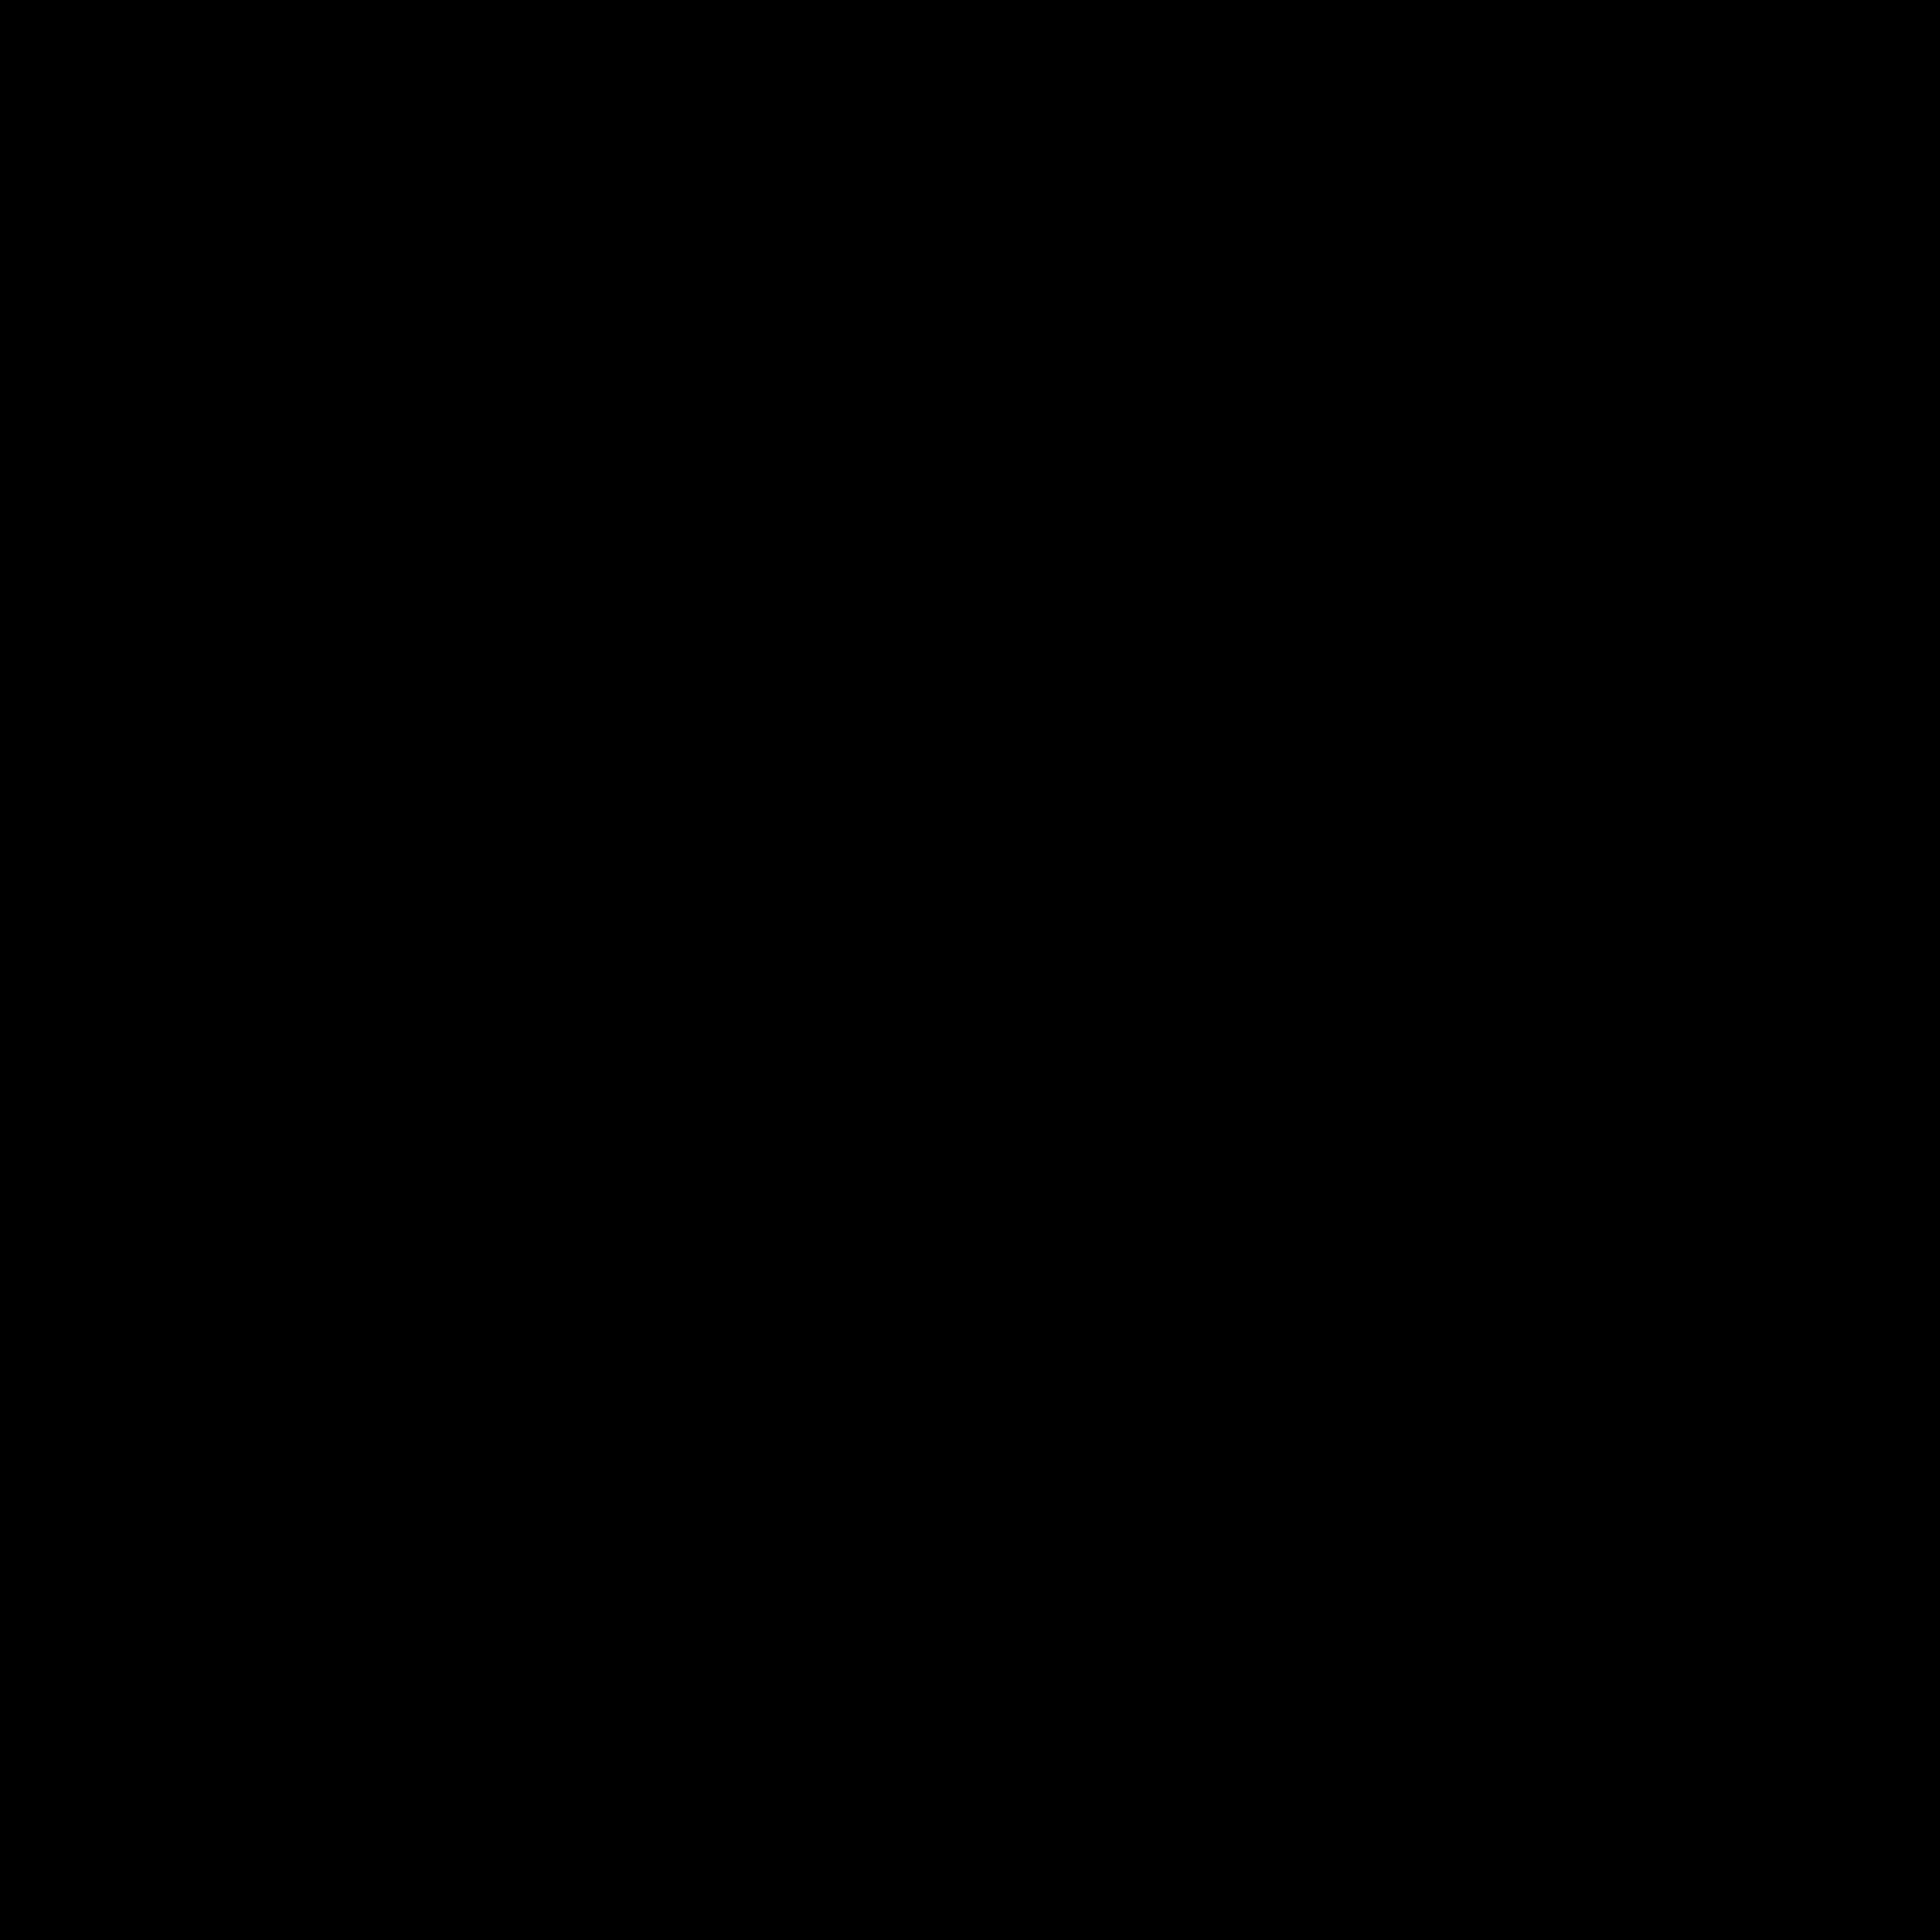 Nannestadfestivalen-logo i sort